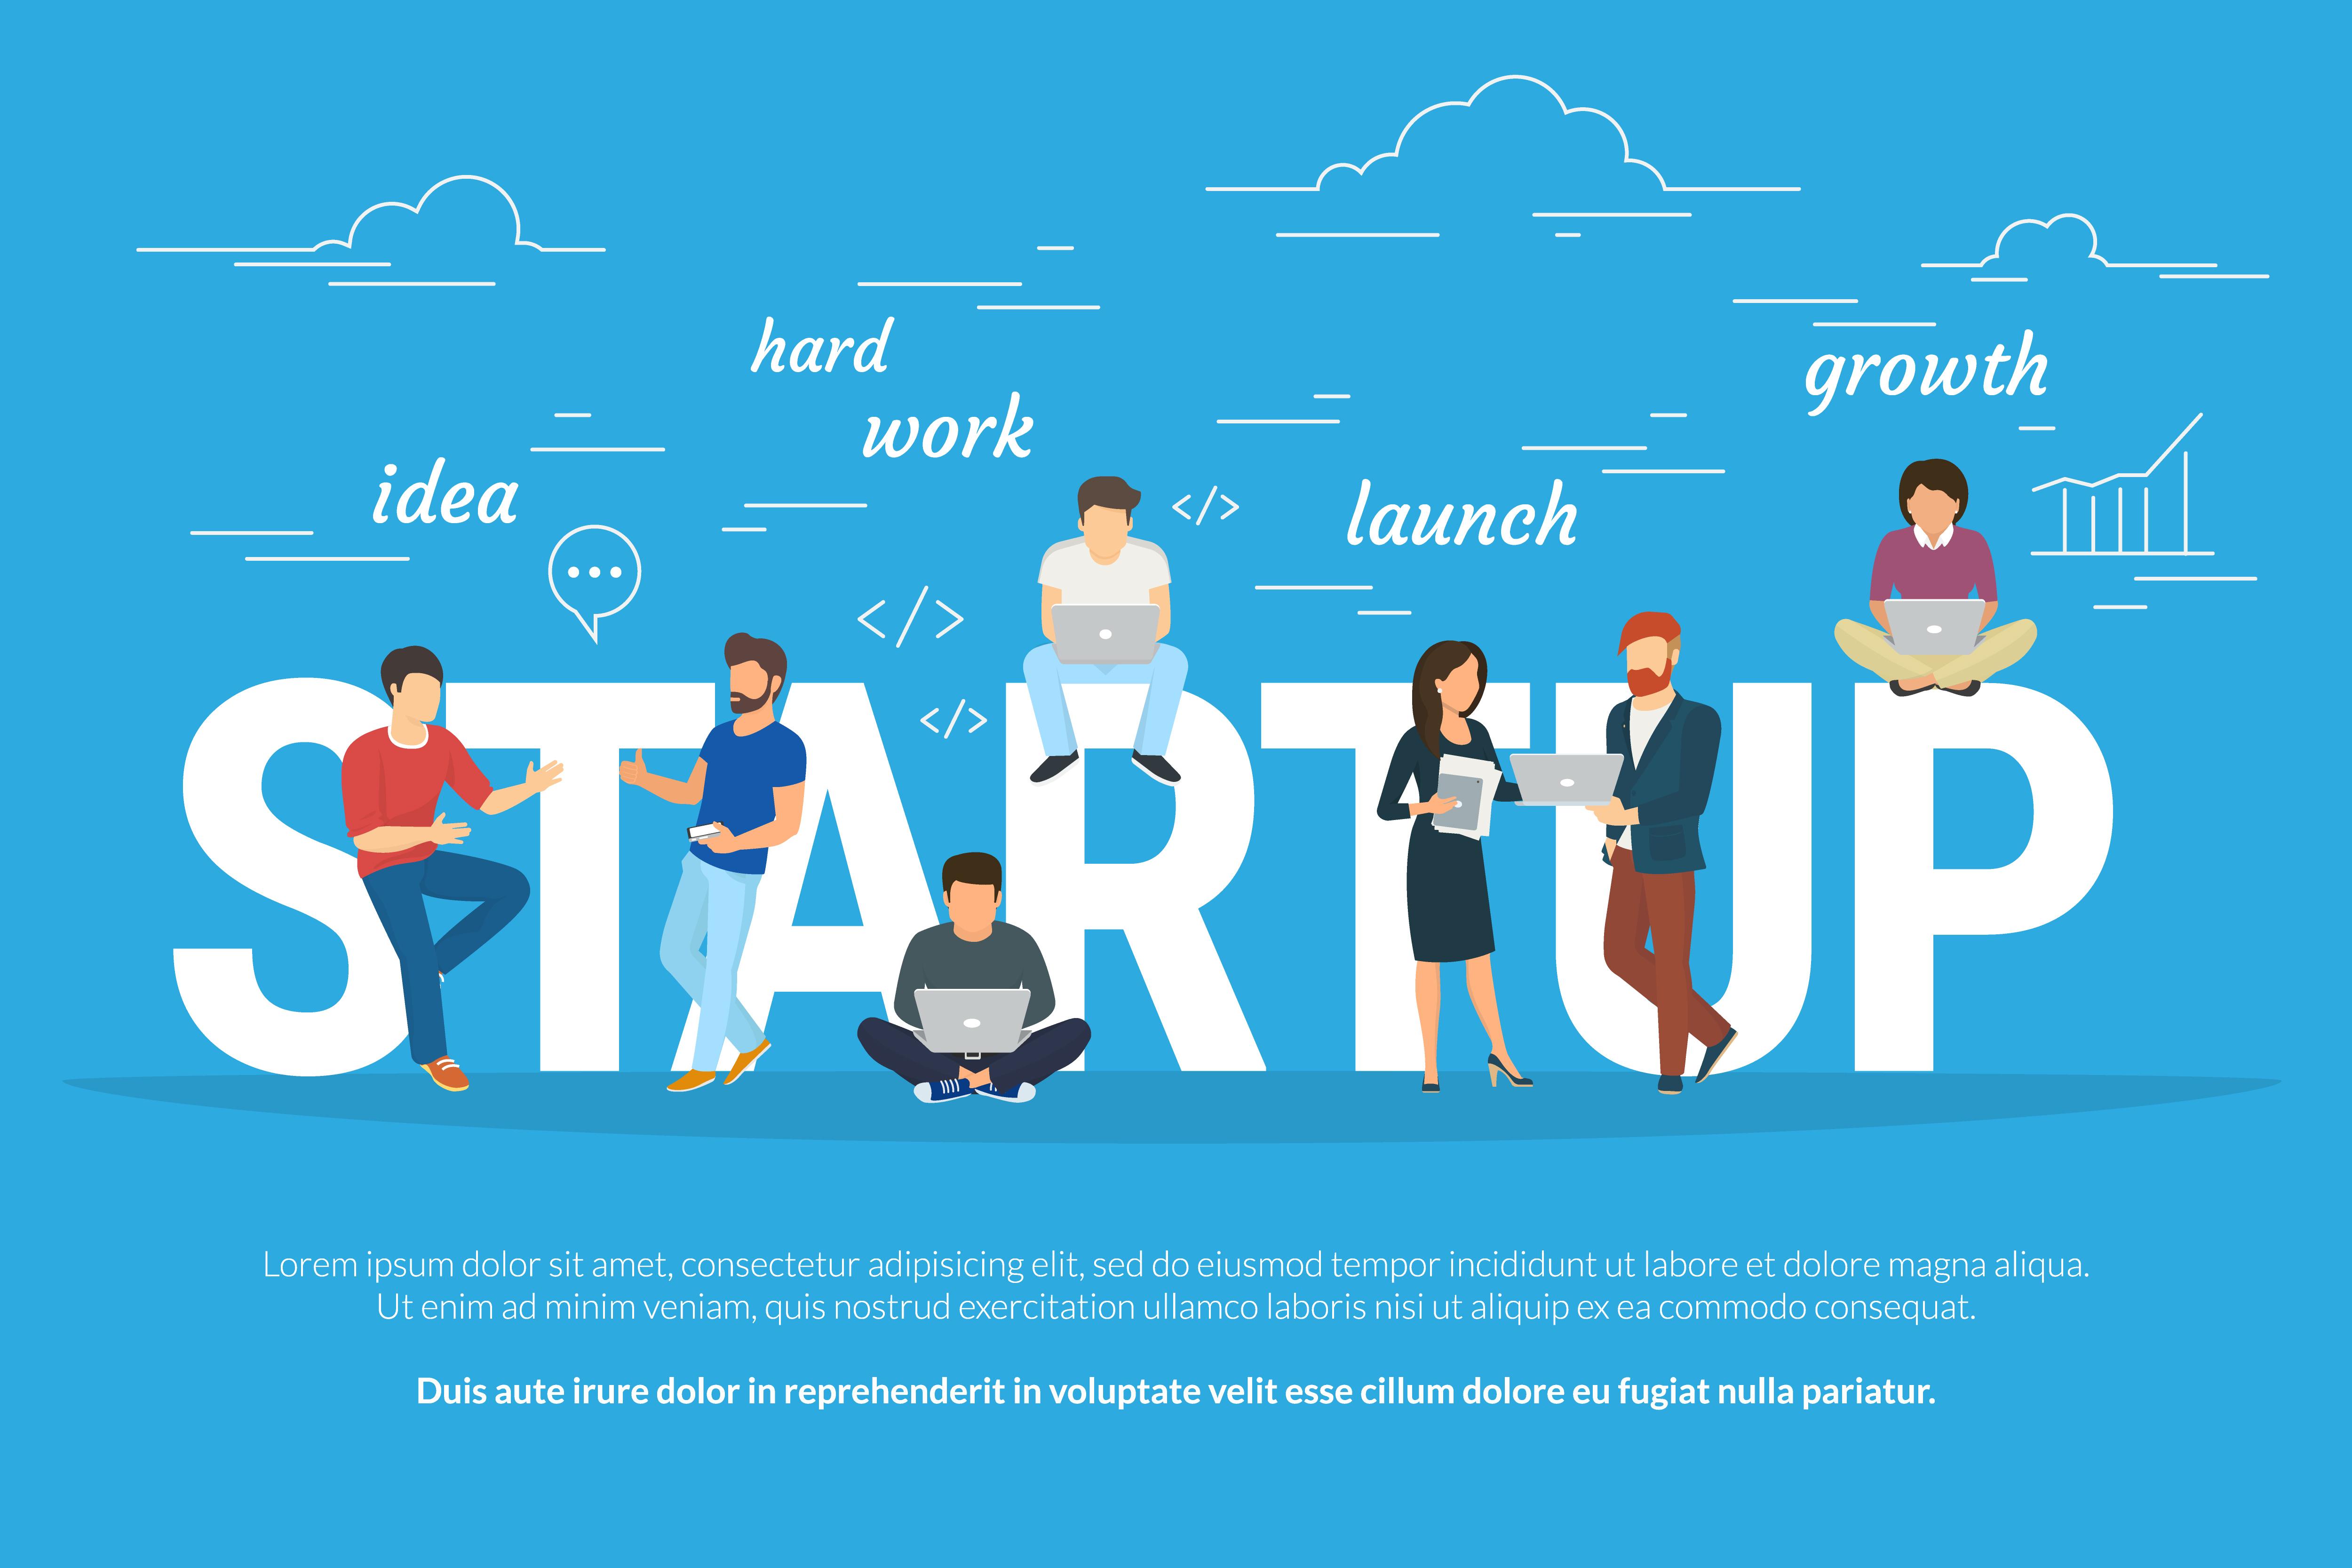 Venture capital startup for Idee start up e commerce